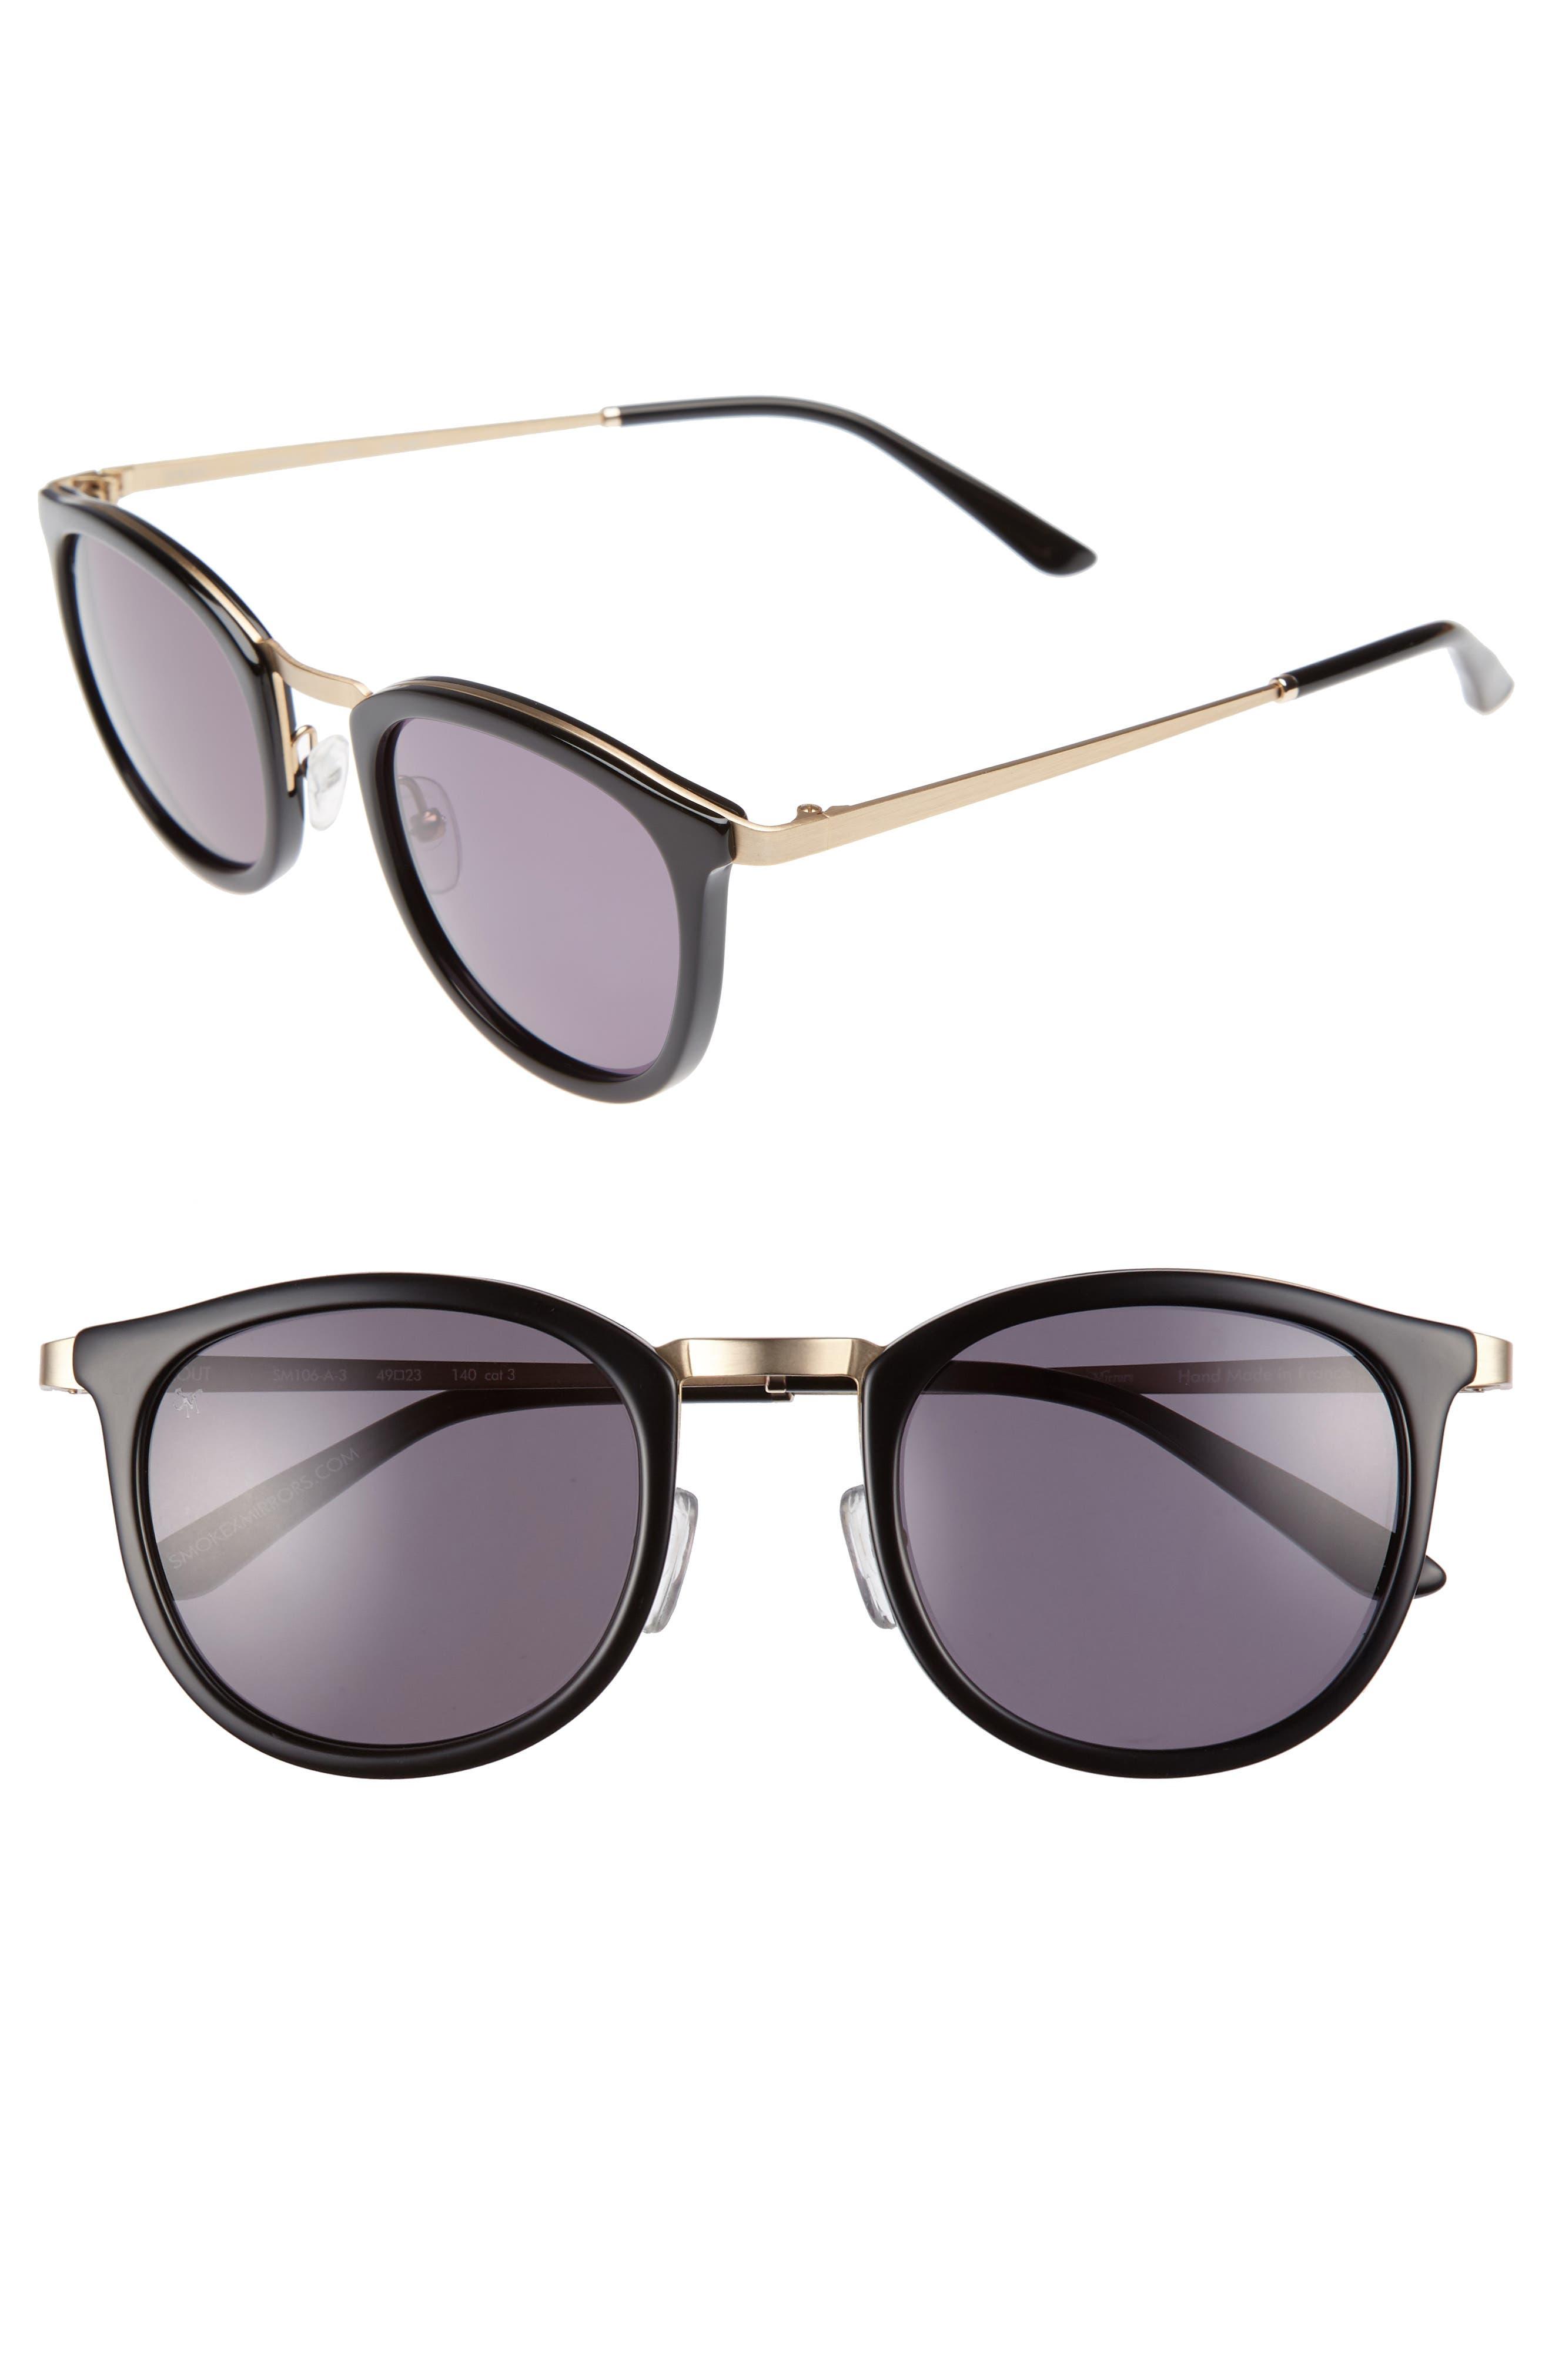 Shout 49mm Retro Sunglasses,                         Main,                         color, BLACK/ GREY